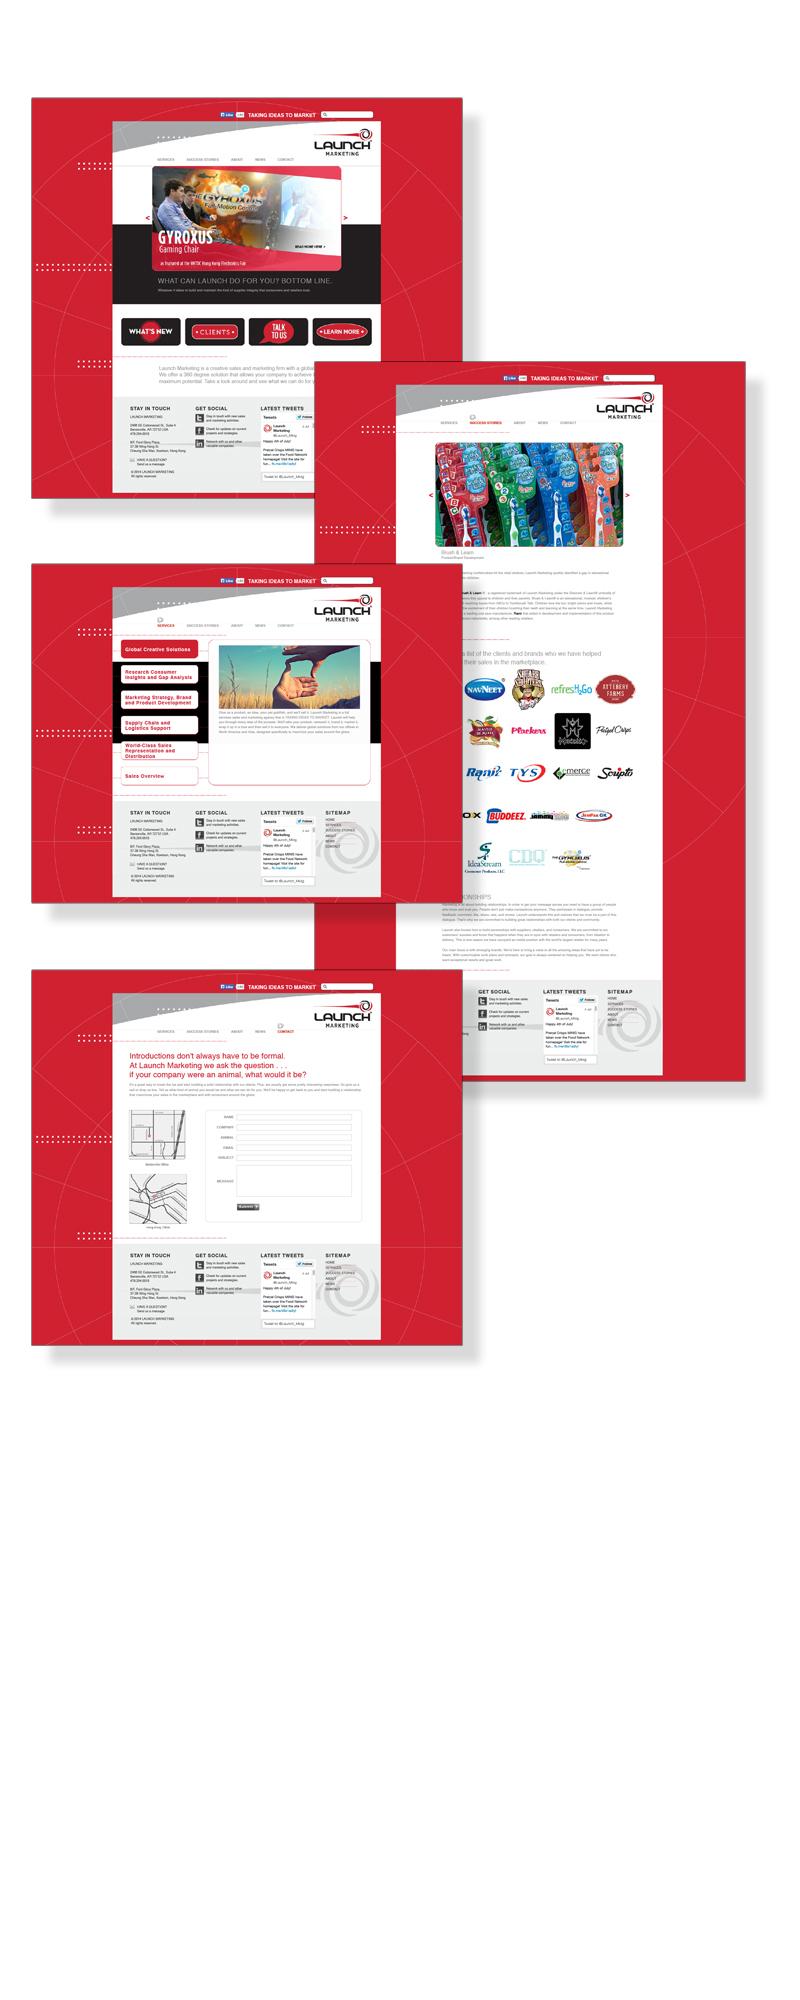 launch-pages-tmoss-portfolio.jpg